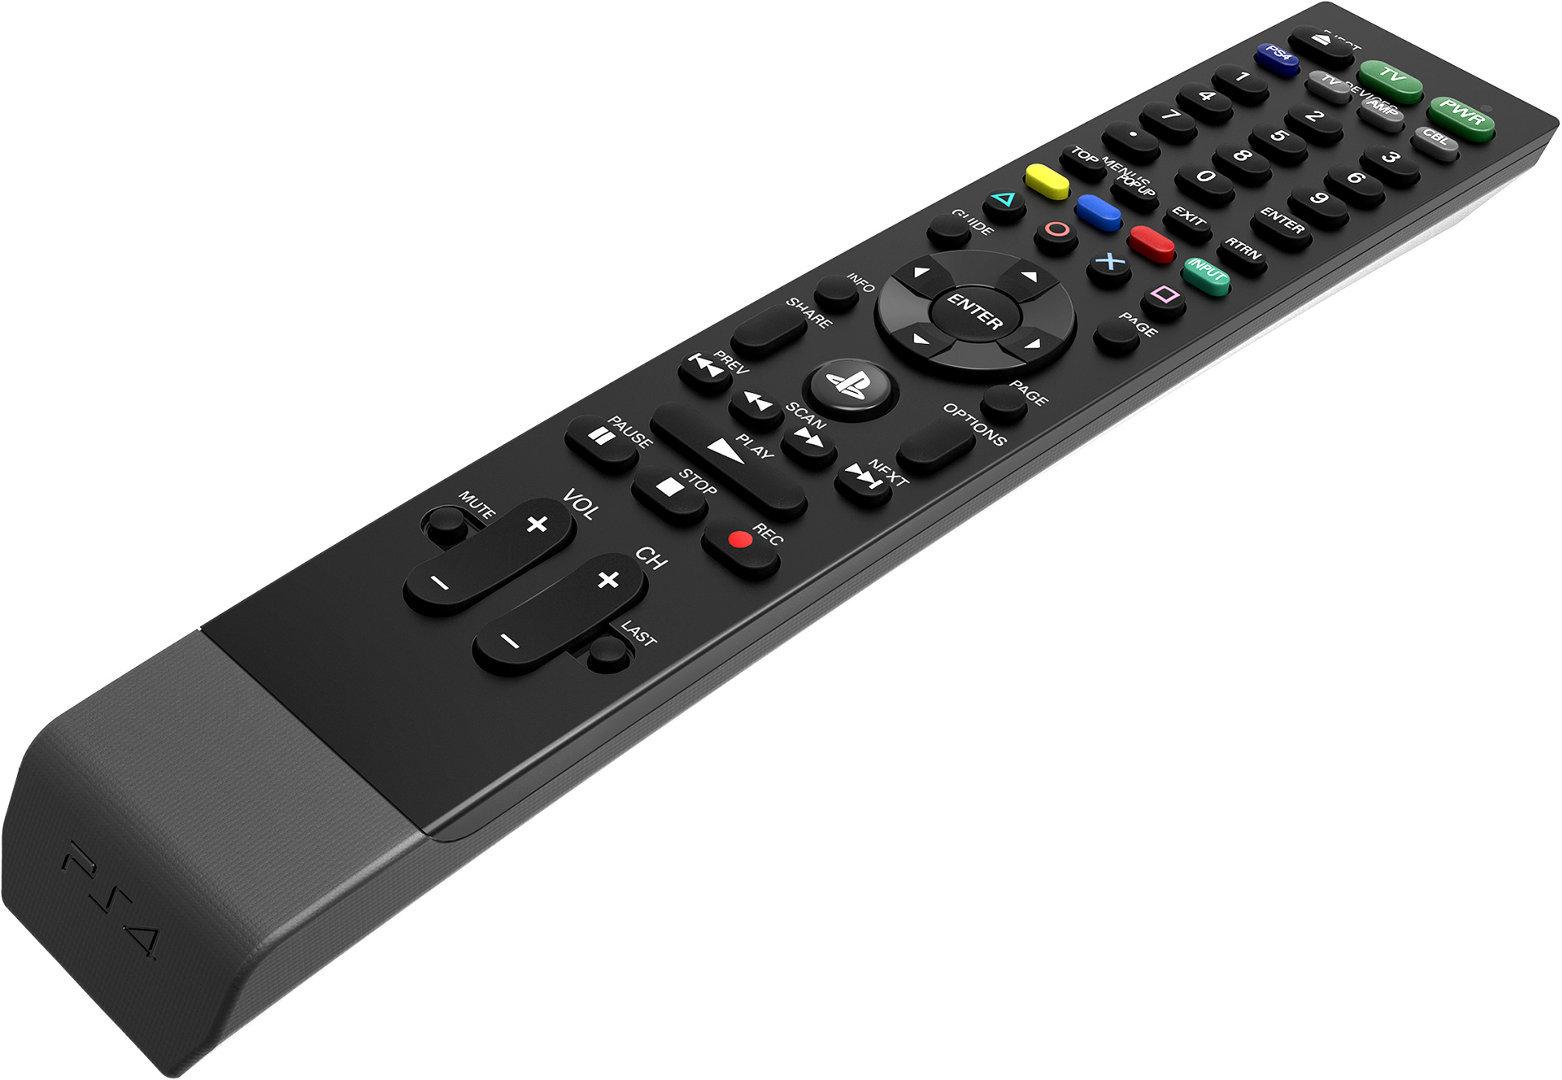 Sony Media Remote